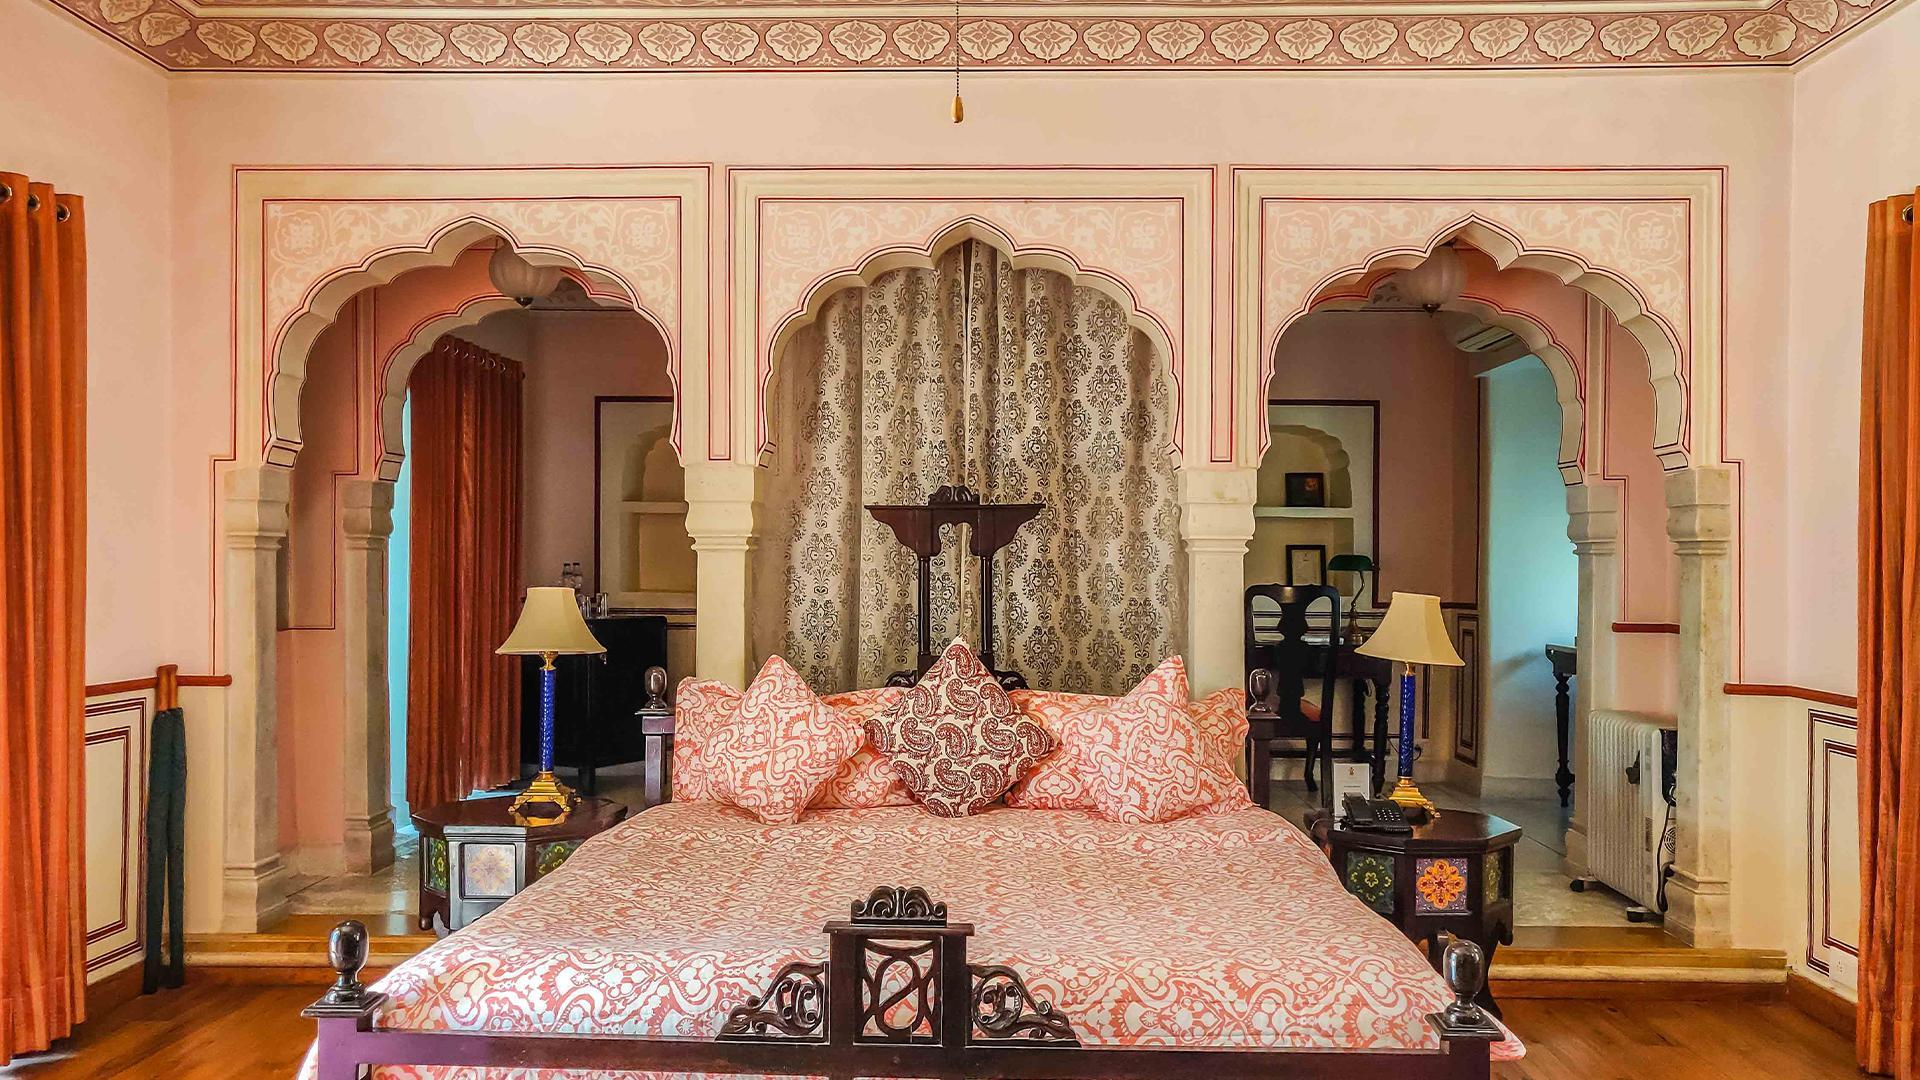 Heritage Premium Suite image 1 at Royal Heritage Haveli by Jaipur, Rajasthan, India